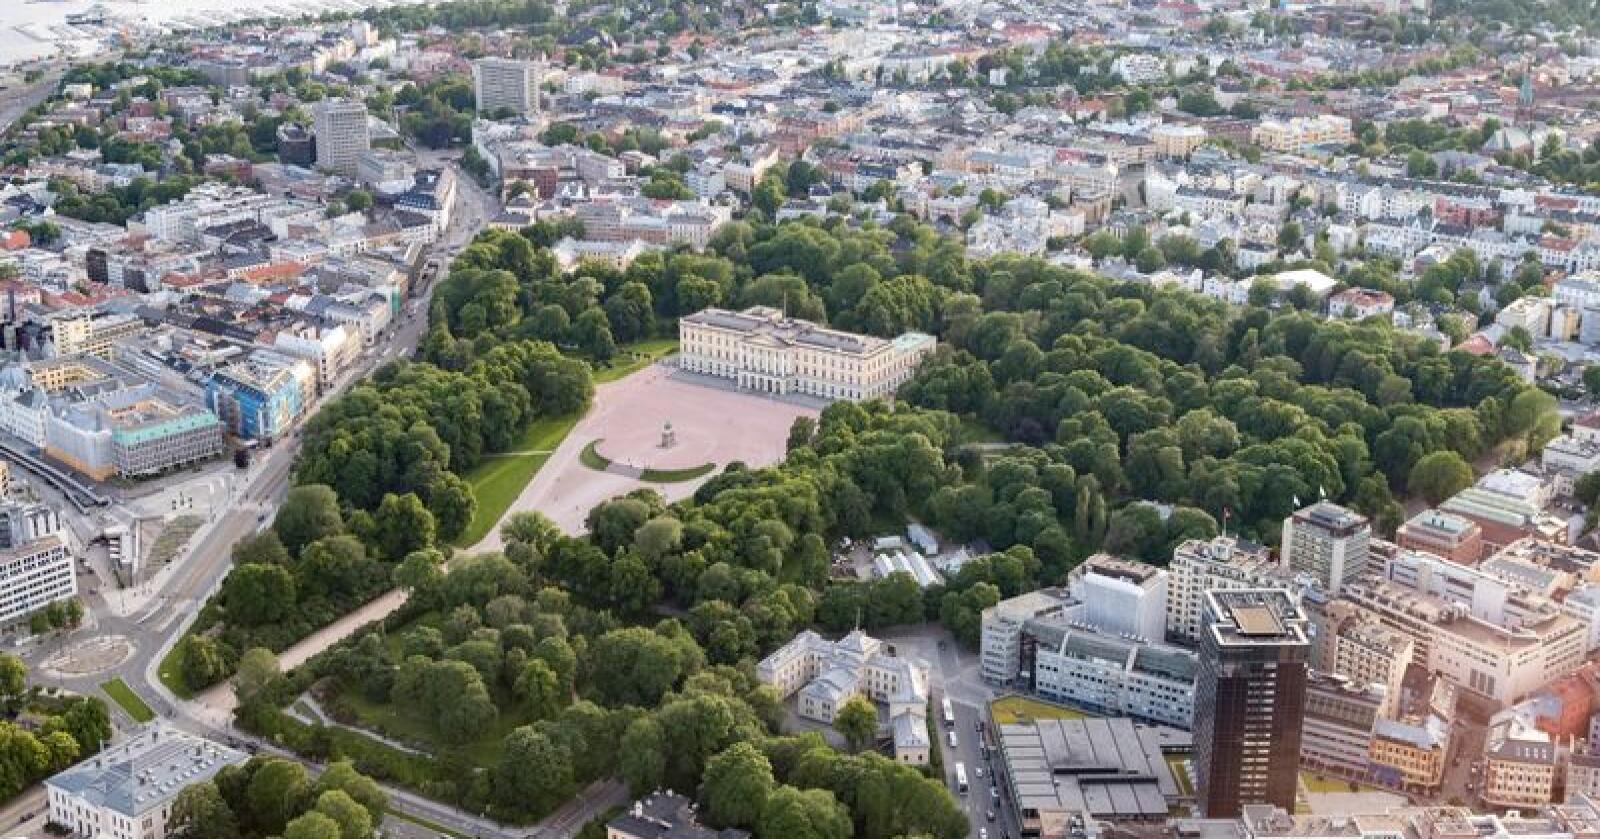 På postnummeret 0260, et lite område mellom Slottet og Frognerparken med til sammen 2500 innbyggere, bor styrelederne i Telenor, Equinor, Petoro og Investinor. I hele Nord-Norge bor det bare to styreledere, som leder styrene i Helse Nord og i Andøya Space Center. Foto: Torstein Bøe / NTB scanpix